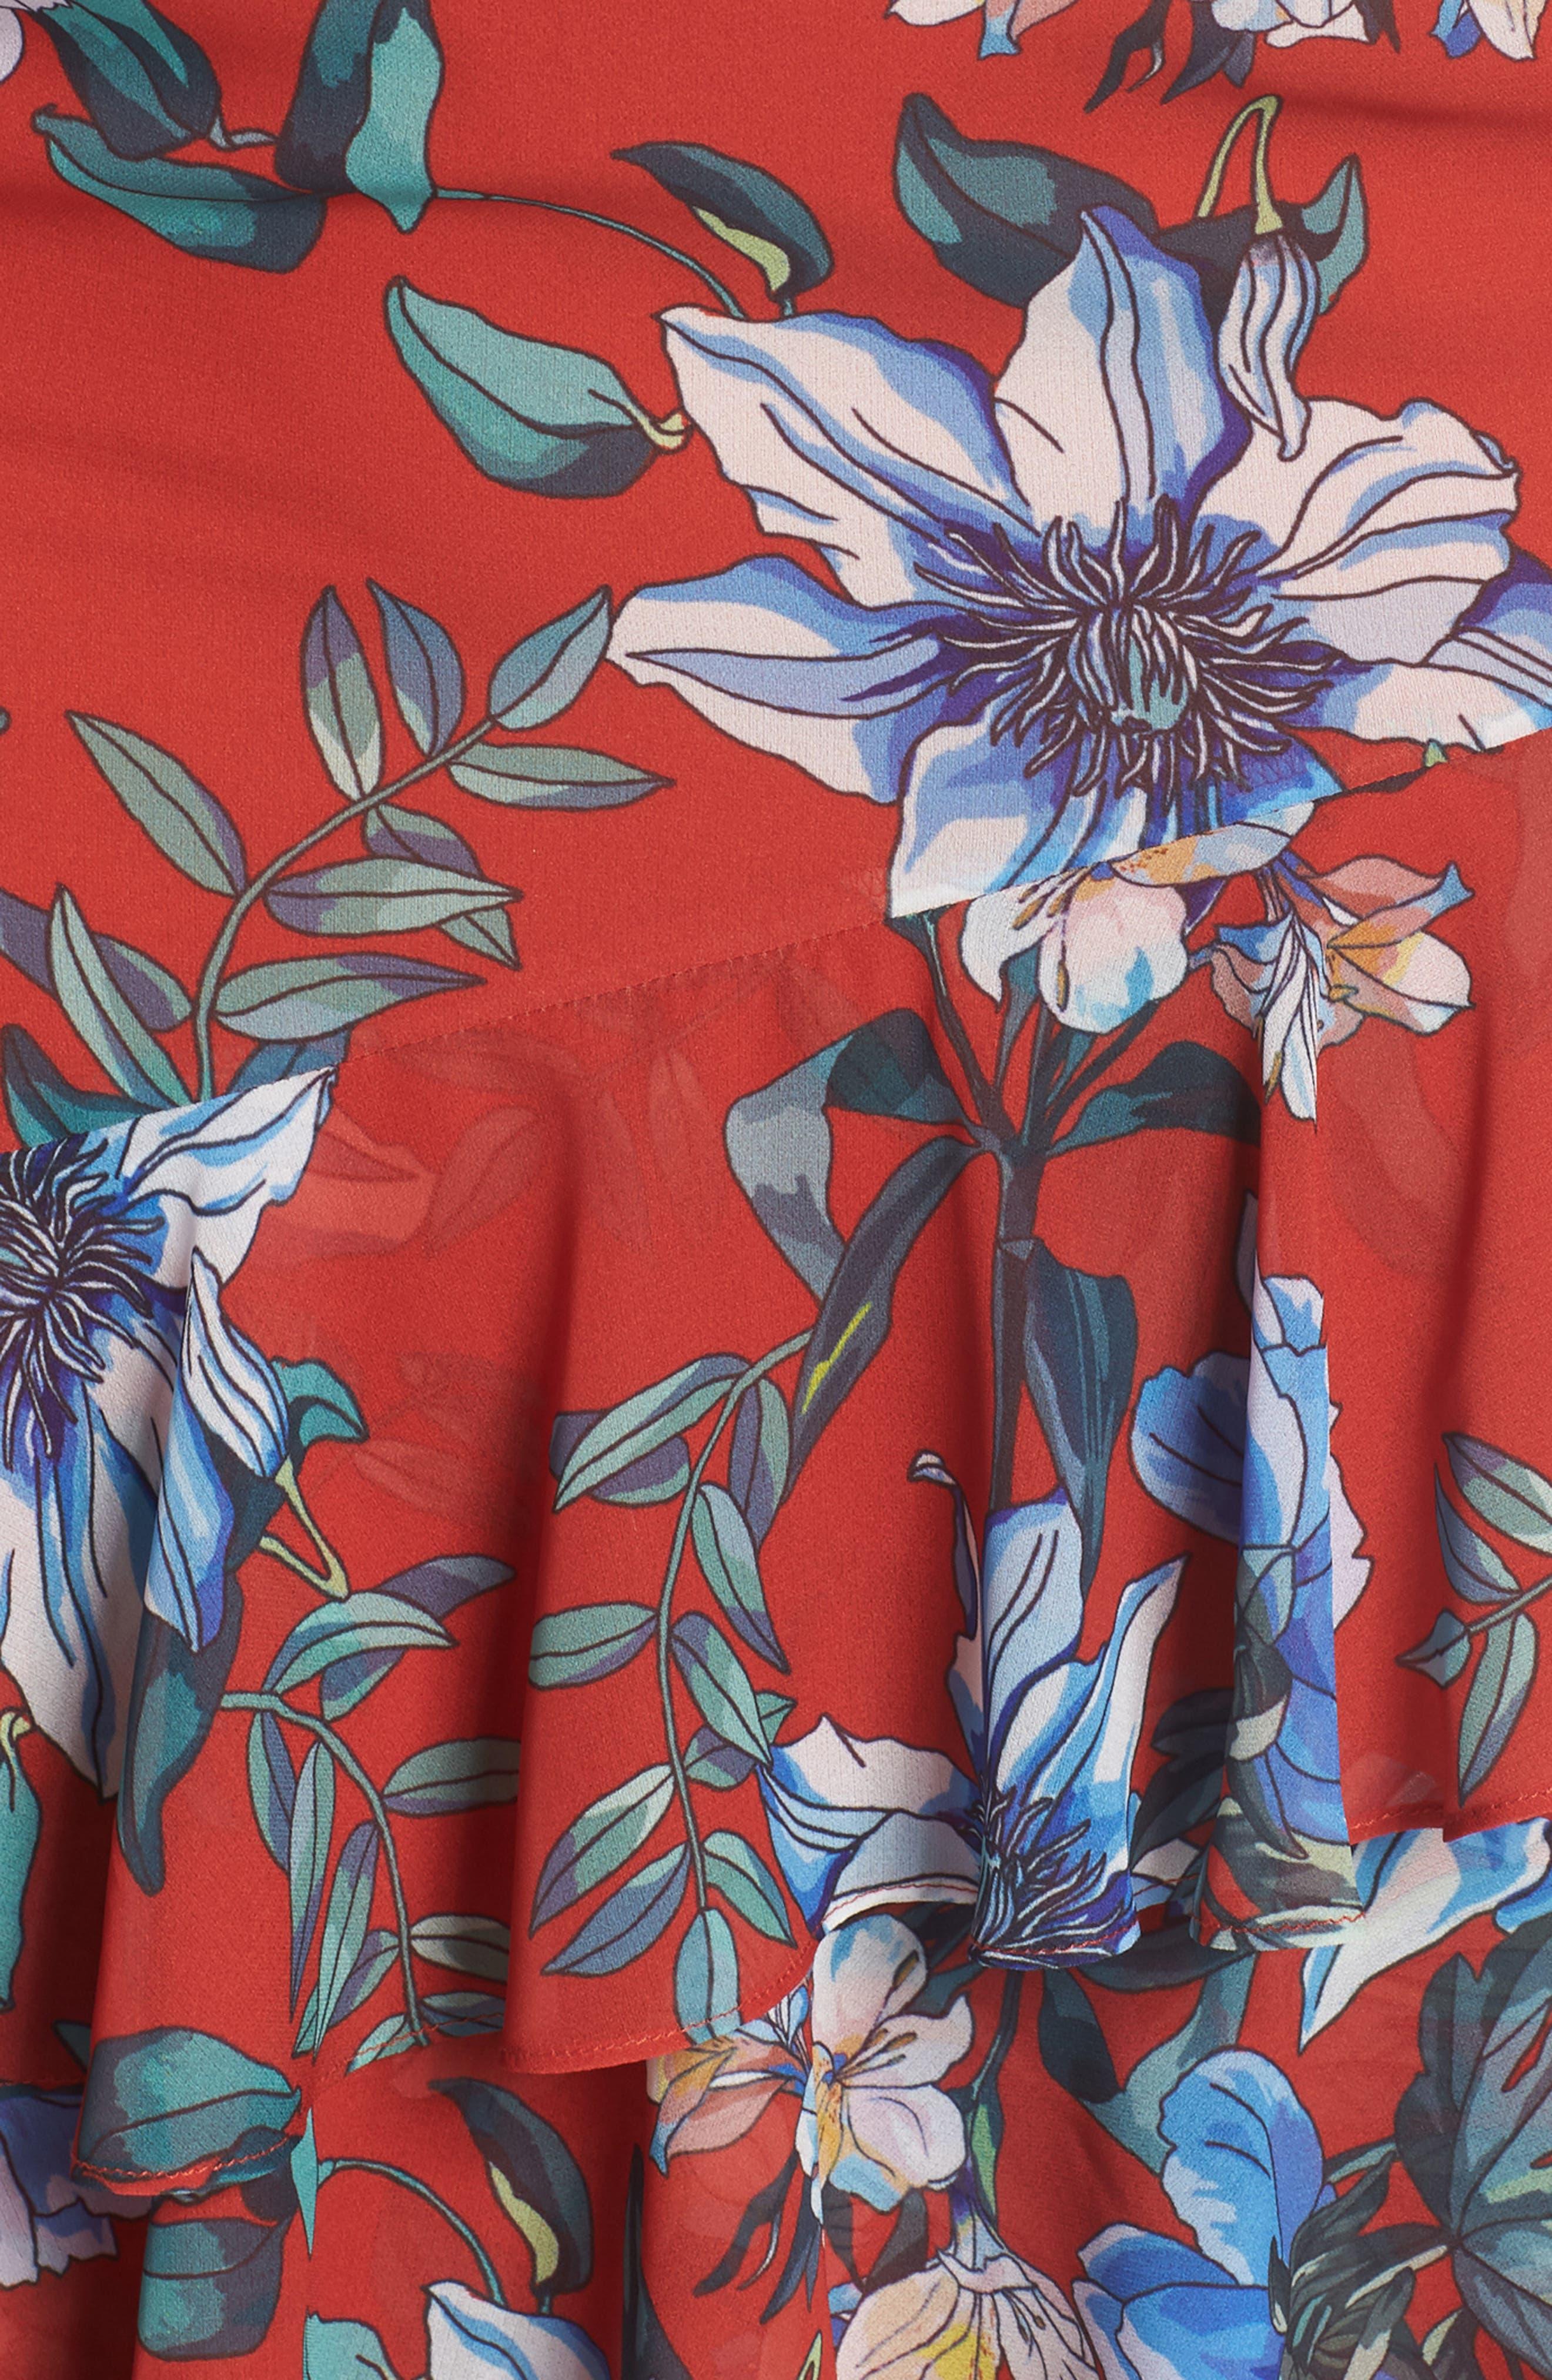 Floral Asymmetrical Dress,                             Alternate thumbnail 5, color,                             600